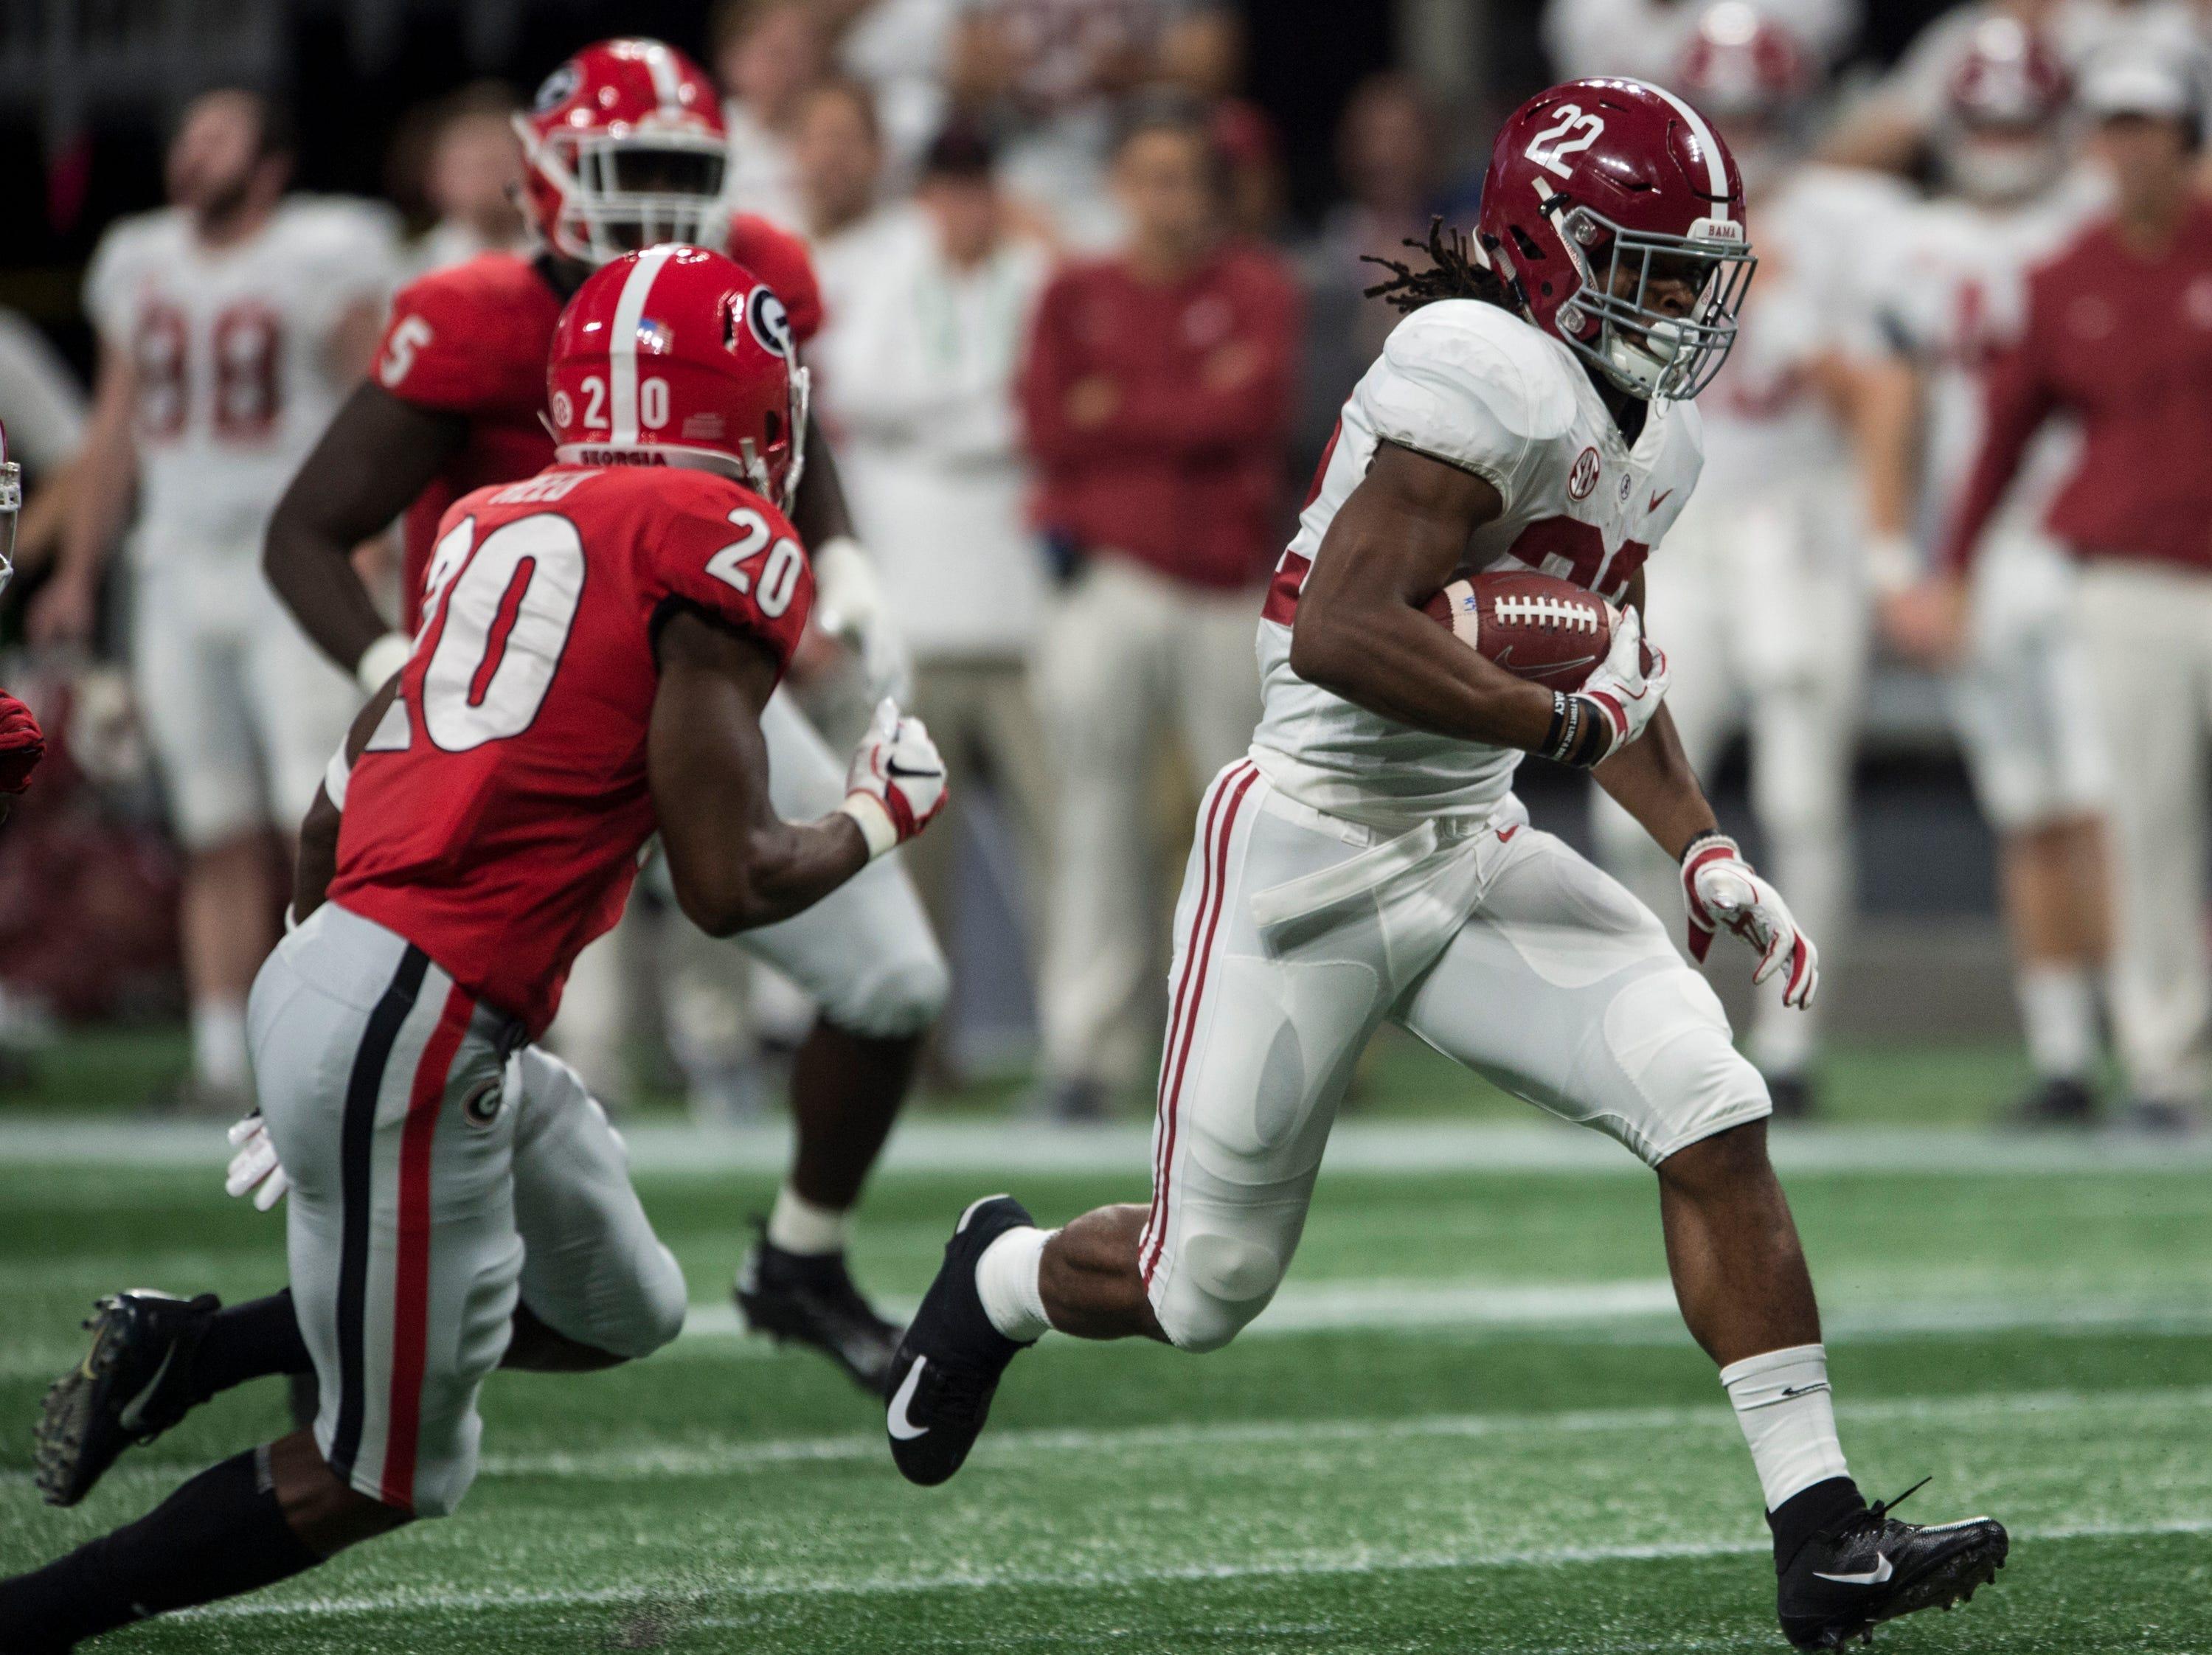 Alabama running back Najee Harris (22) runs the ball against Georgia during the SEC Championship game at Mercedes-Benz Stadium in Atlanta, Ga., on Saturday Dec. 1, 2018. Alabama defeated Georgia 35-28.